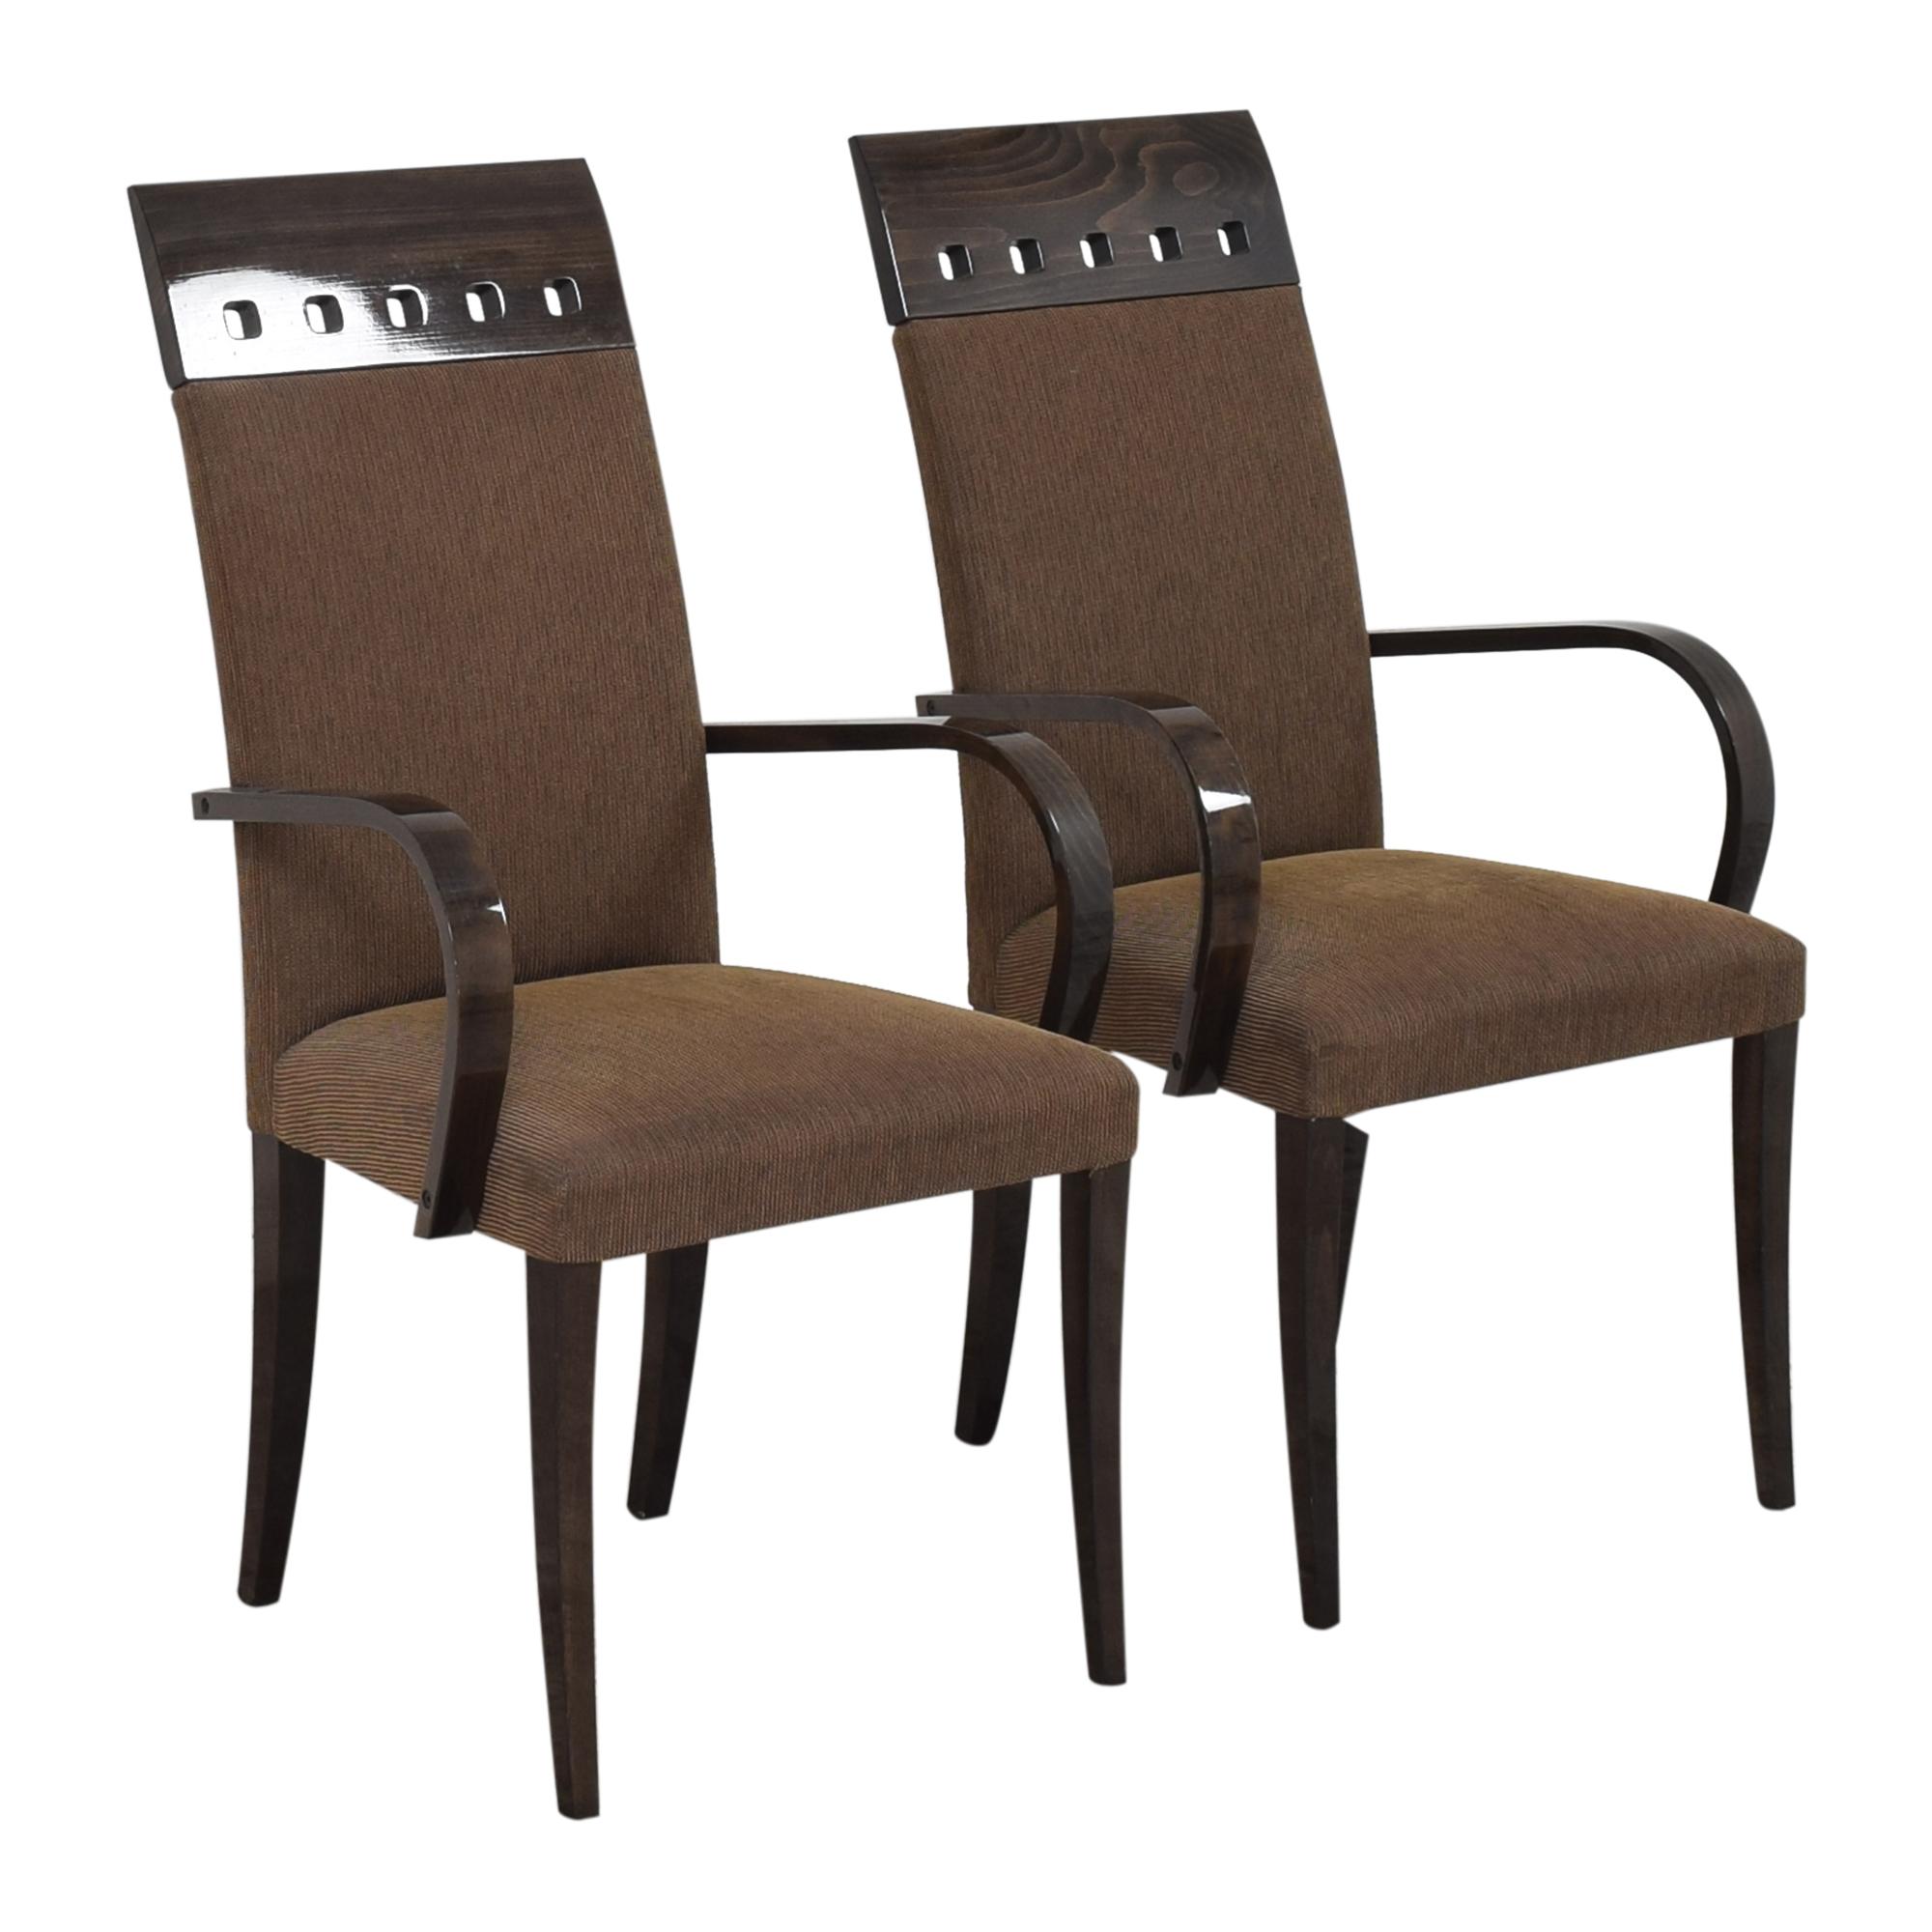 shop Pietro Costantini High Back Dining Arm Chairs Pietro Costantini Chairs